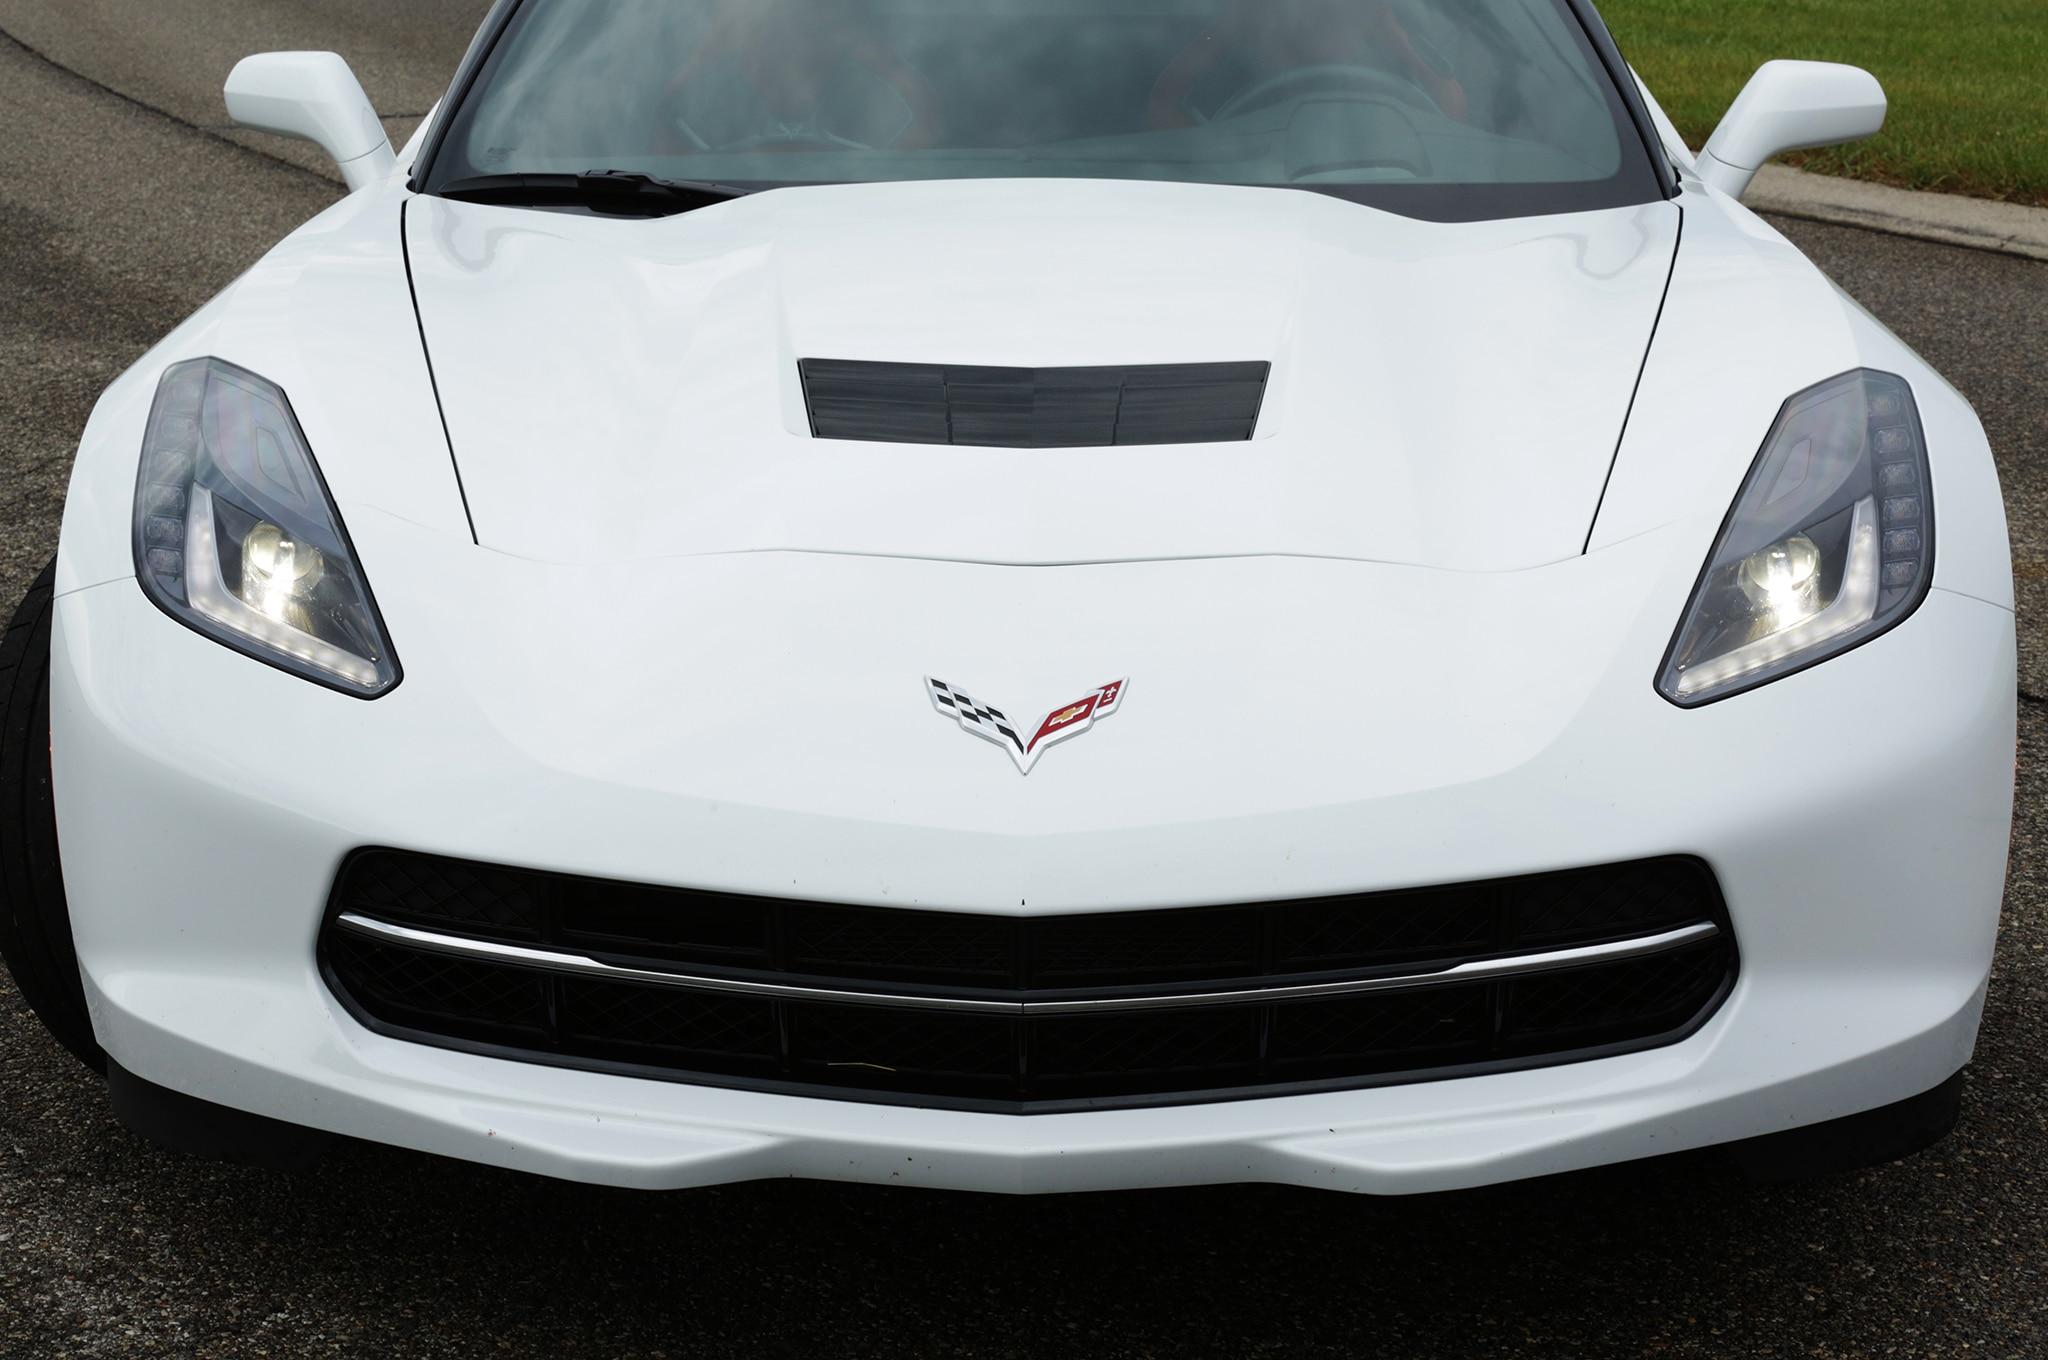 2014 Chevrolet Corvette Stingray - Four Seasons Wrap-Up